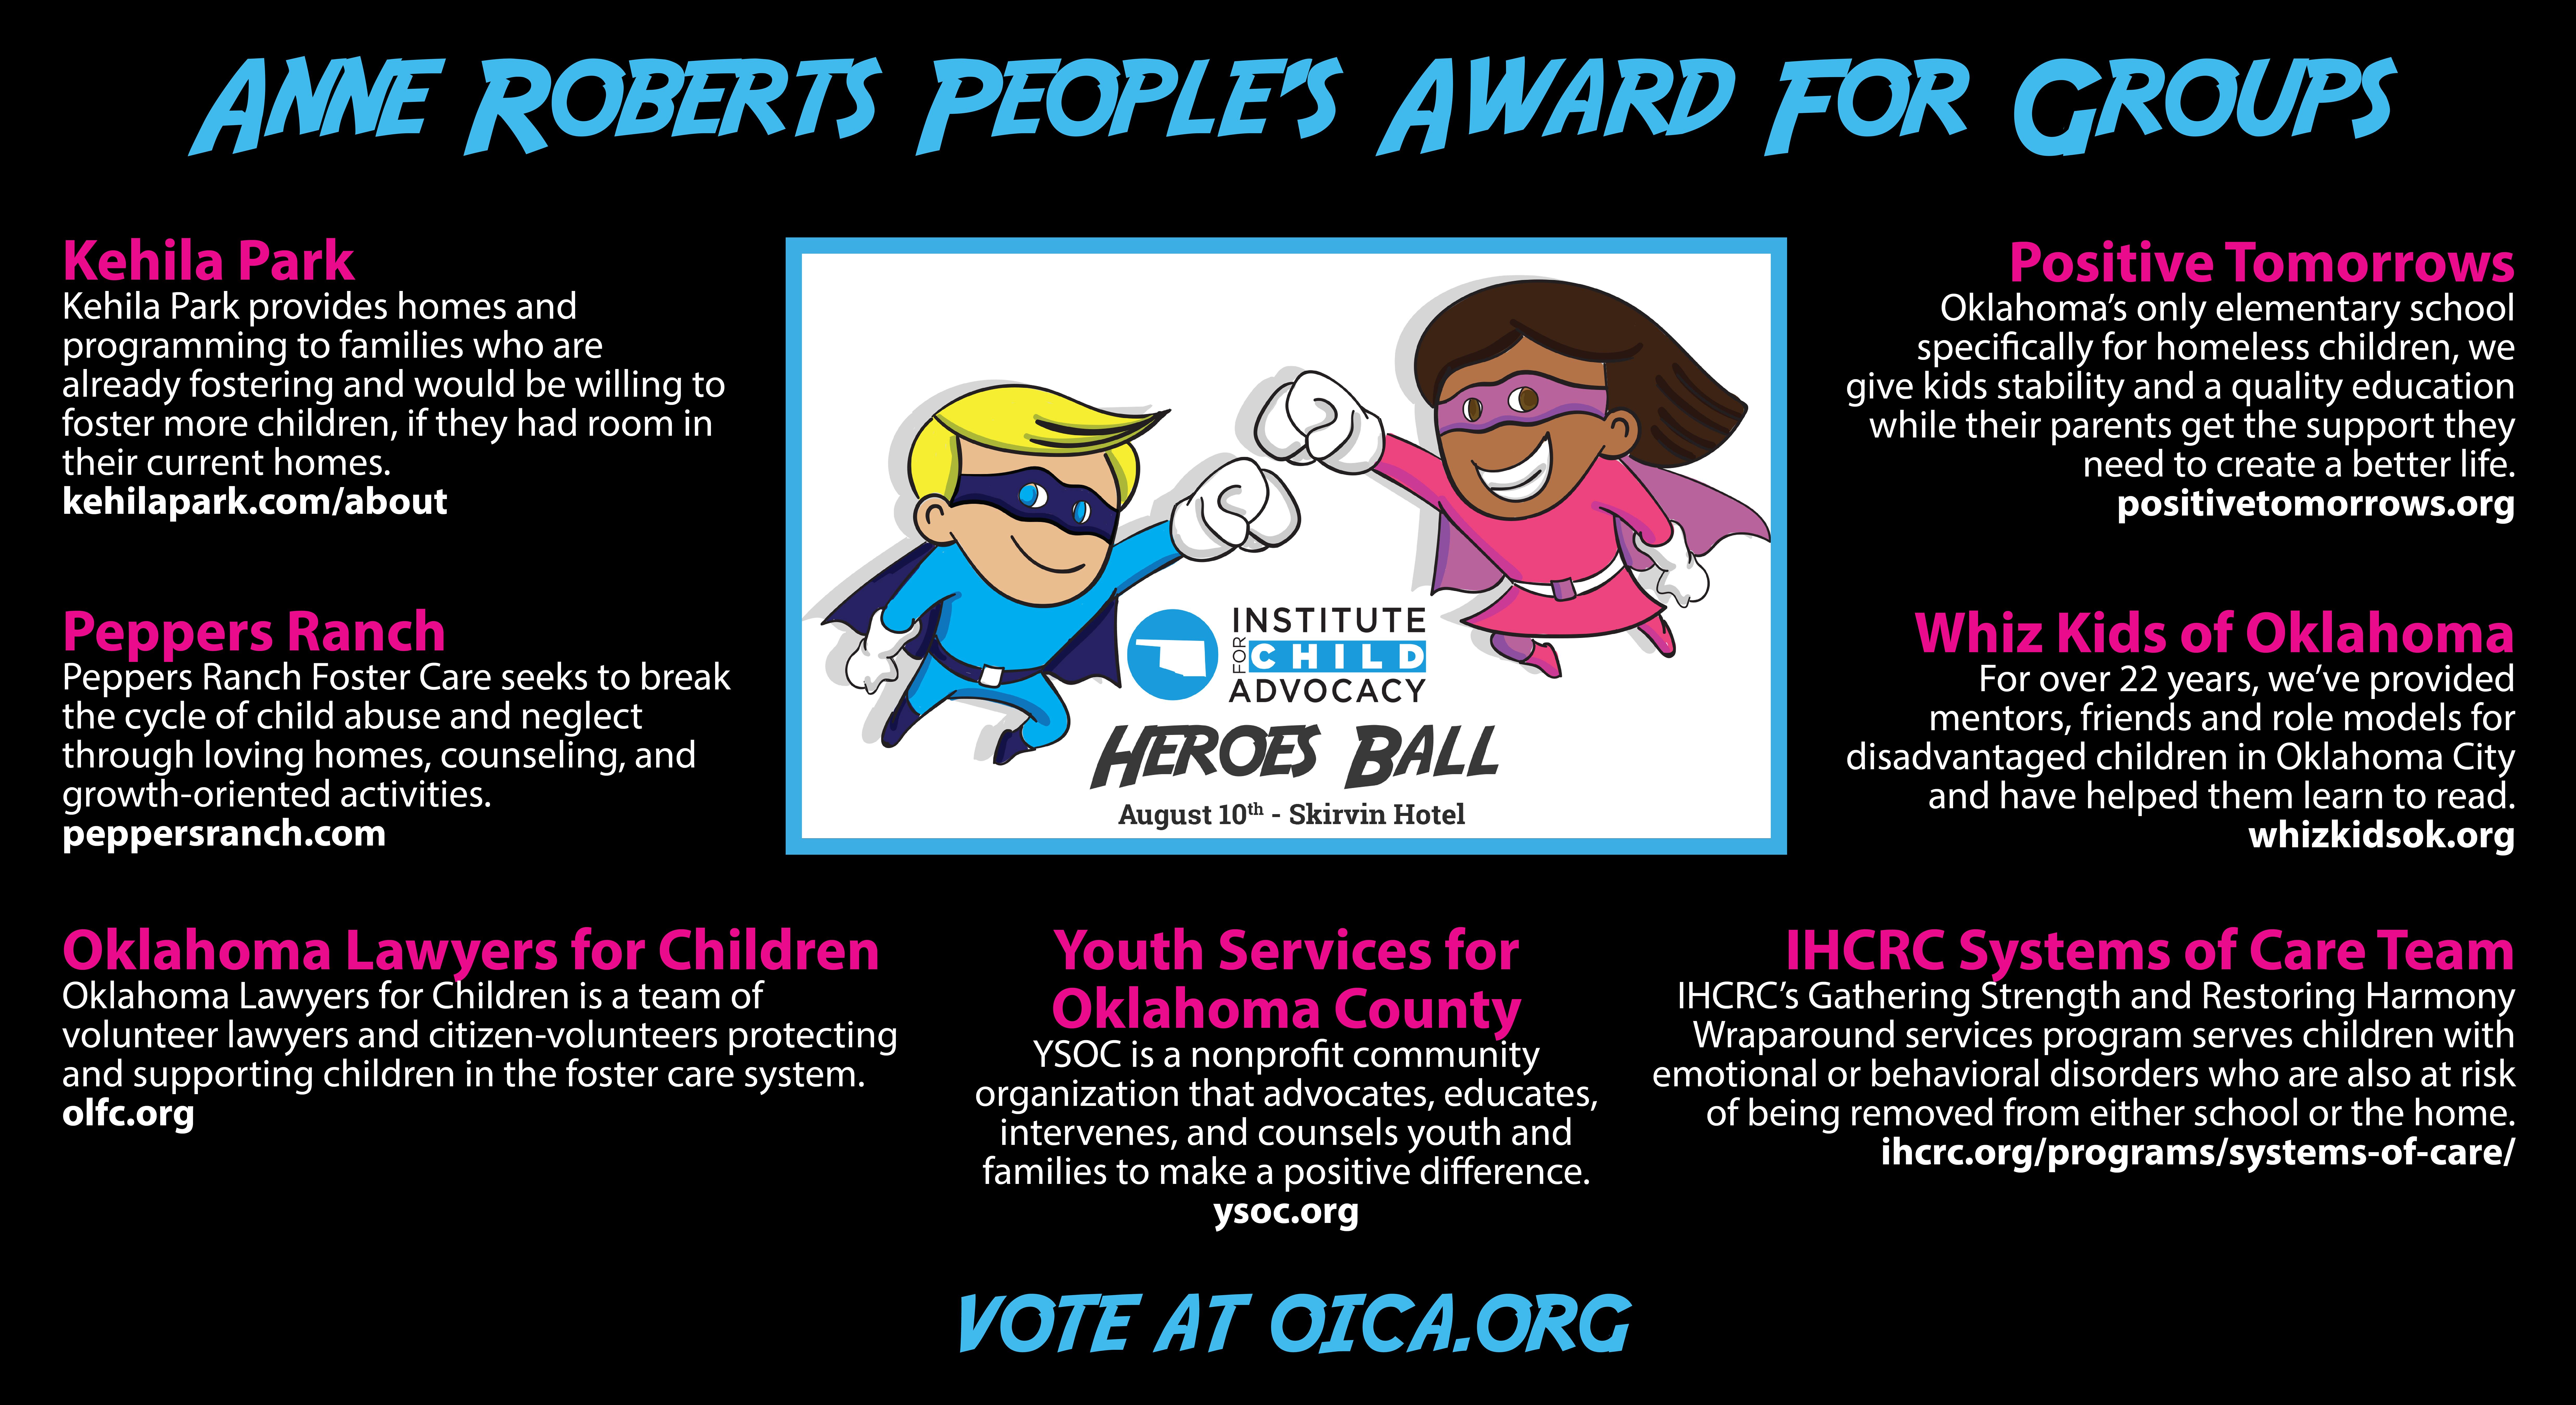 Anne_Roberts_Award_Groups.jpg